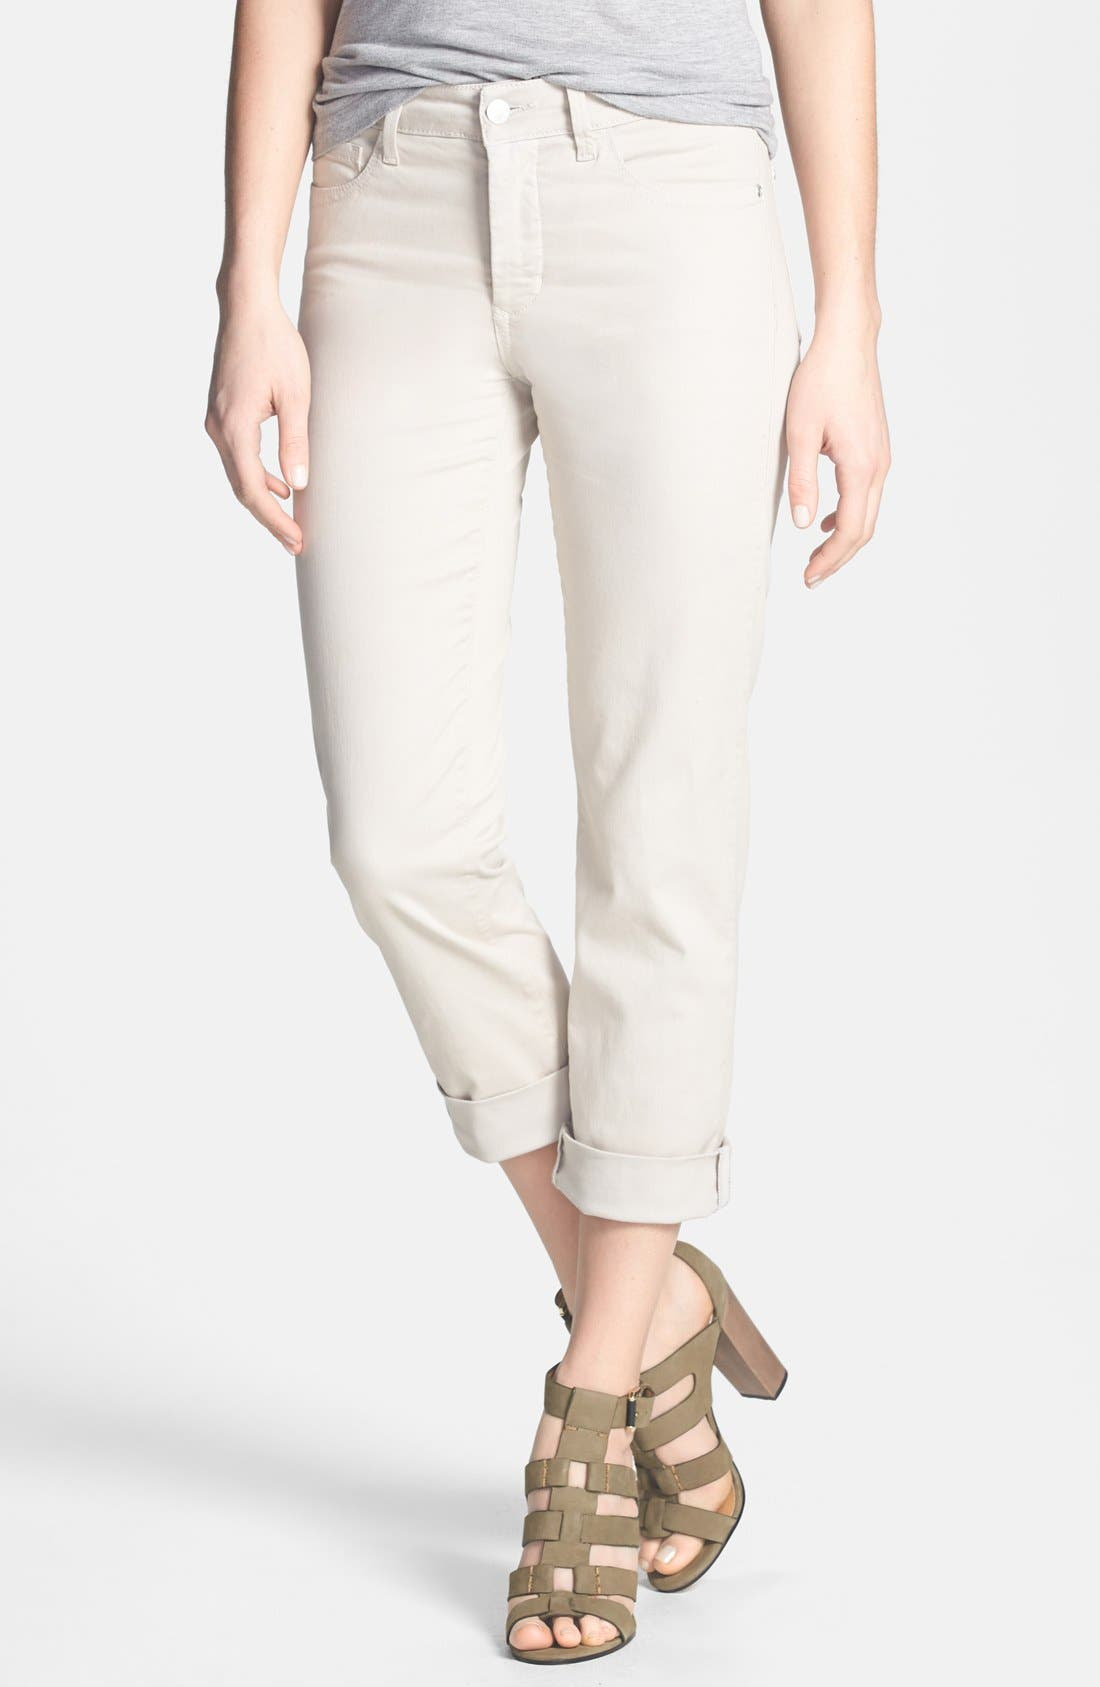 Main Image - NYDJ 'Bobbie' Stretch Boyfriend Jeans (Regular & Petite)